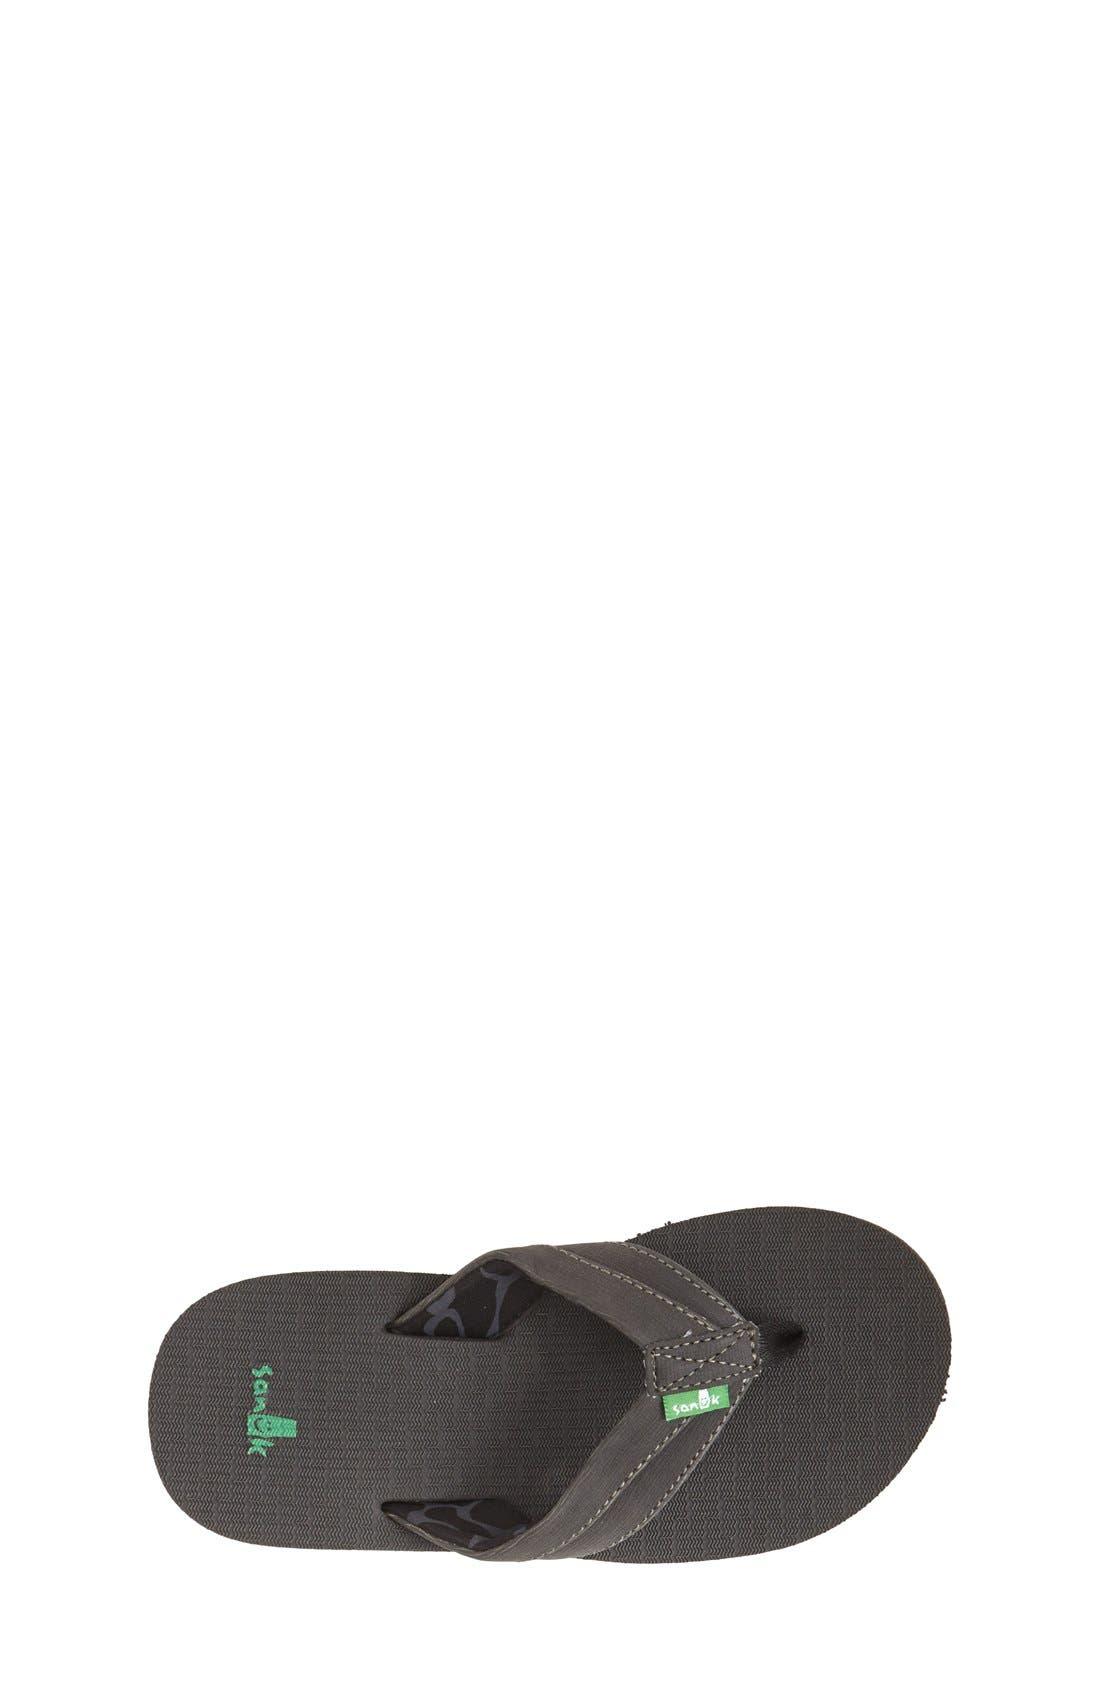 'Rootbeer Cozy' Lightweight Flip Flop Sandal,                             Alternate thumbnail 3, color,                             Black